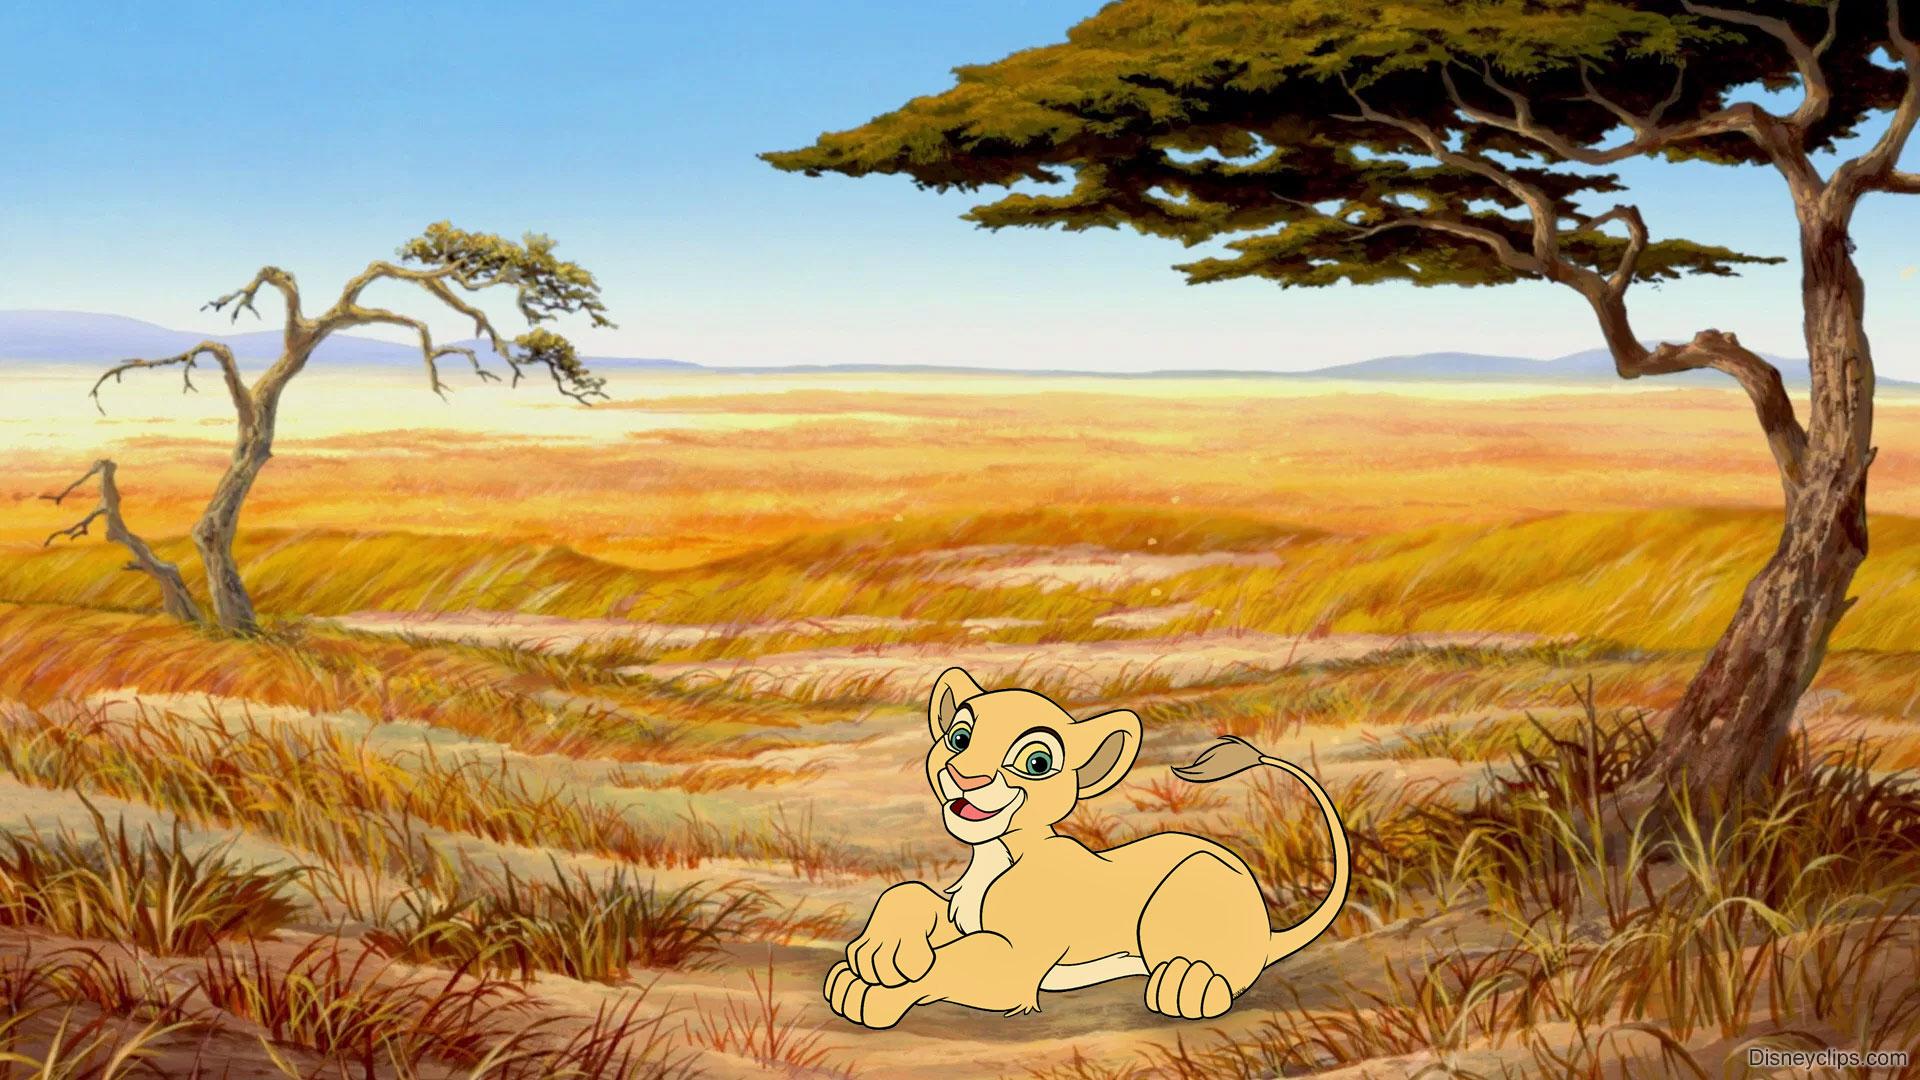 The Lion King Wallpaper Disneyclips Com